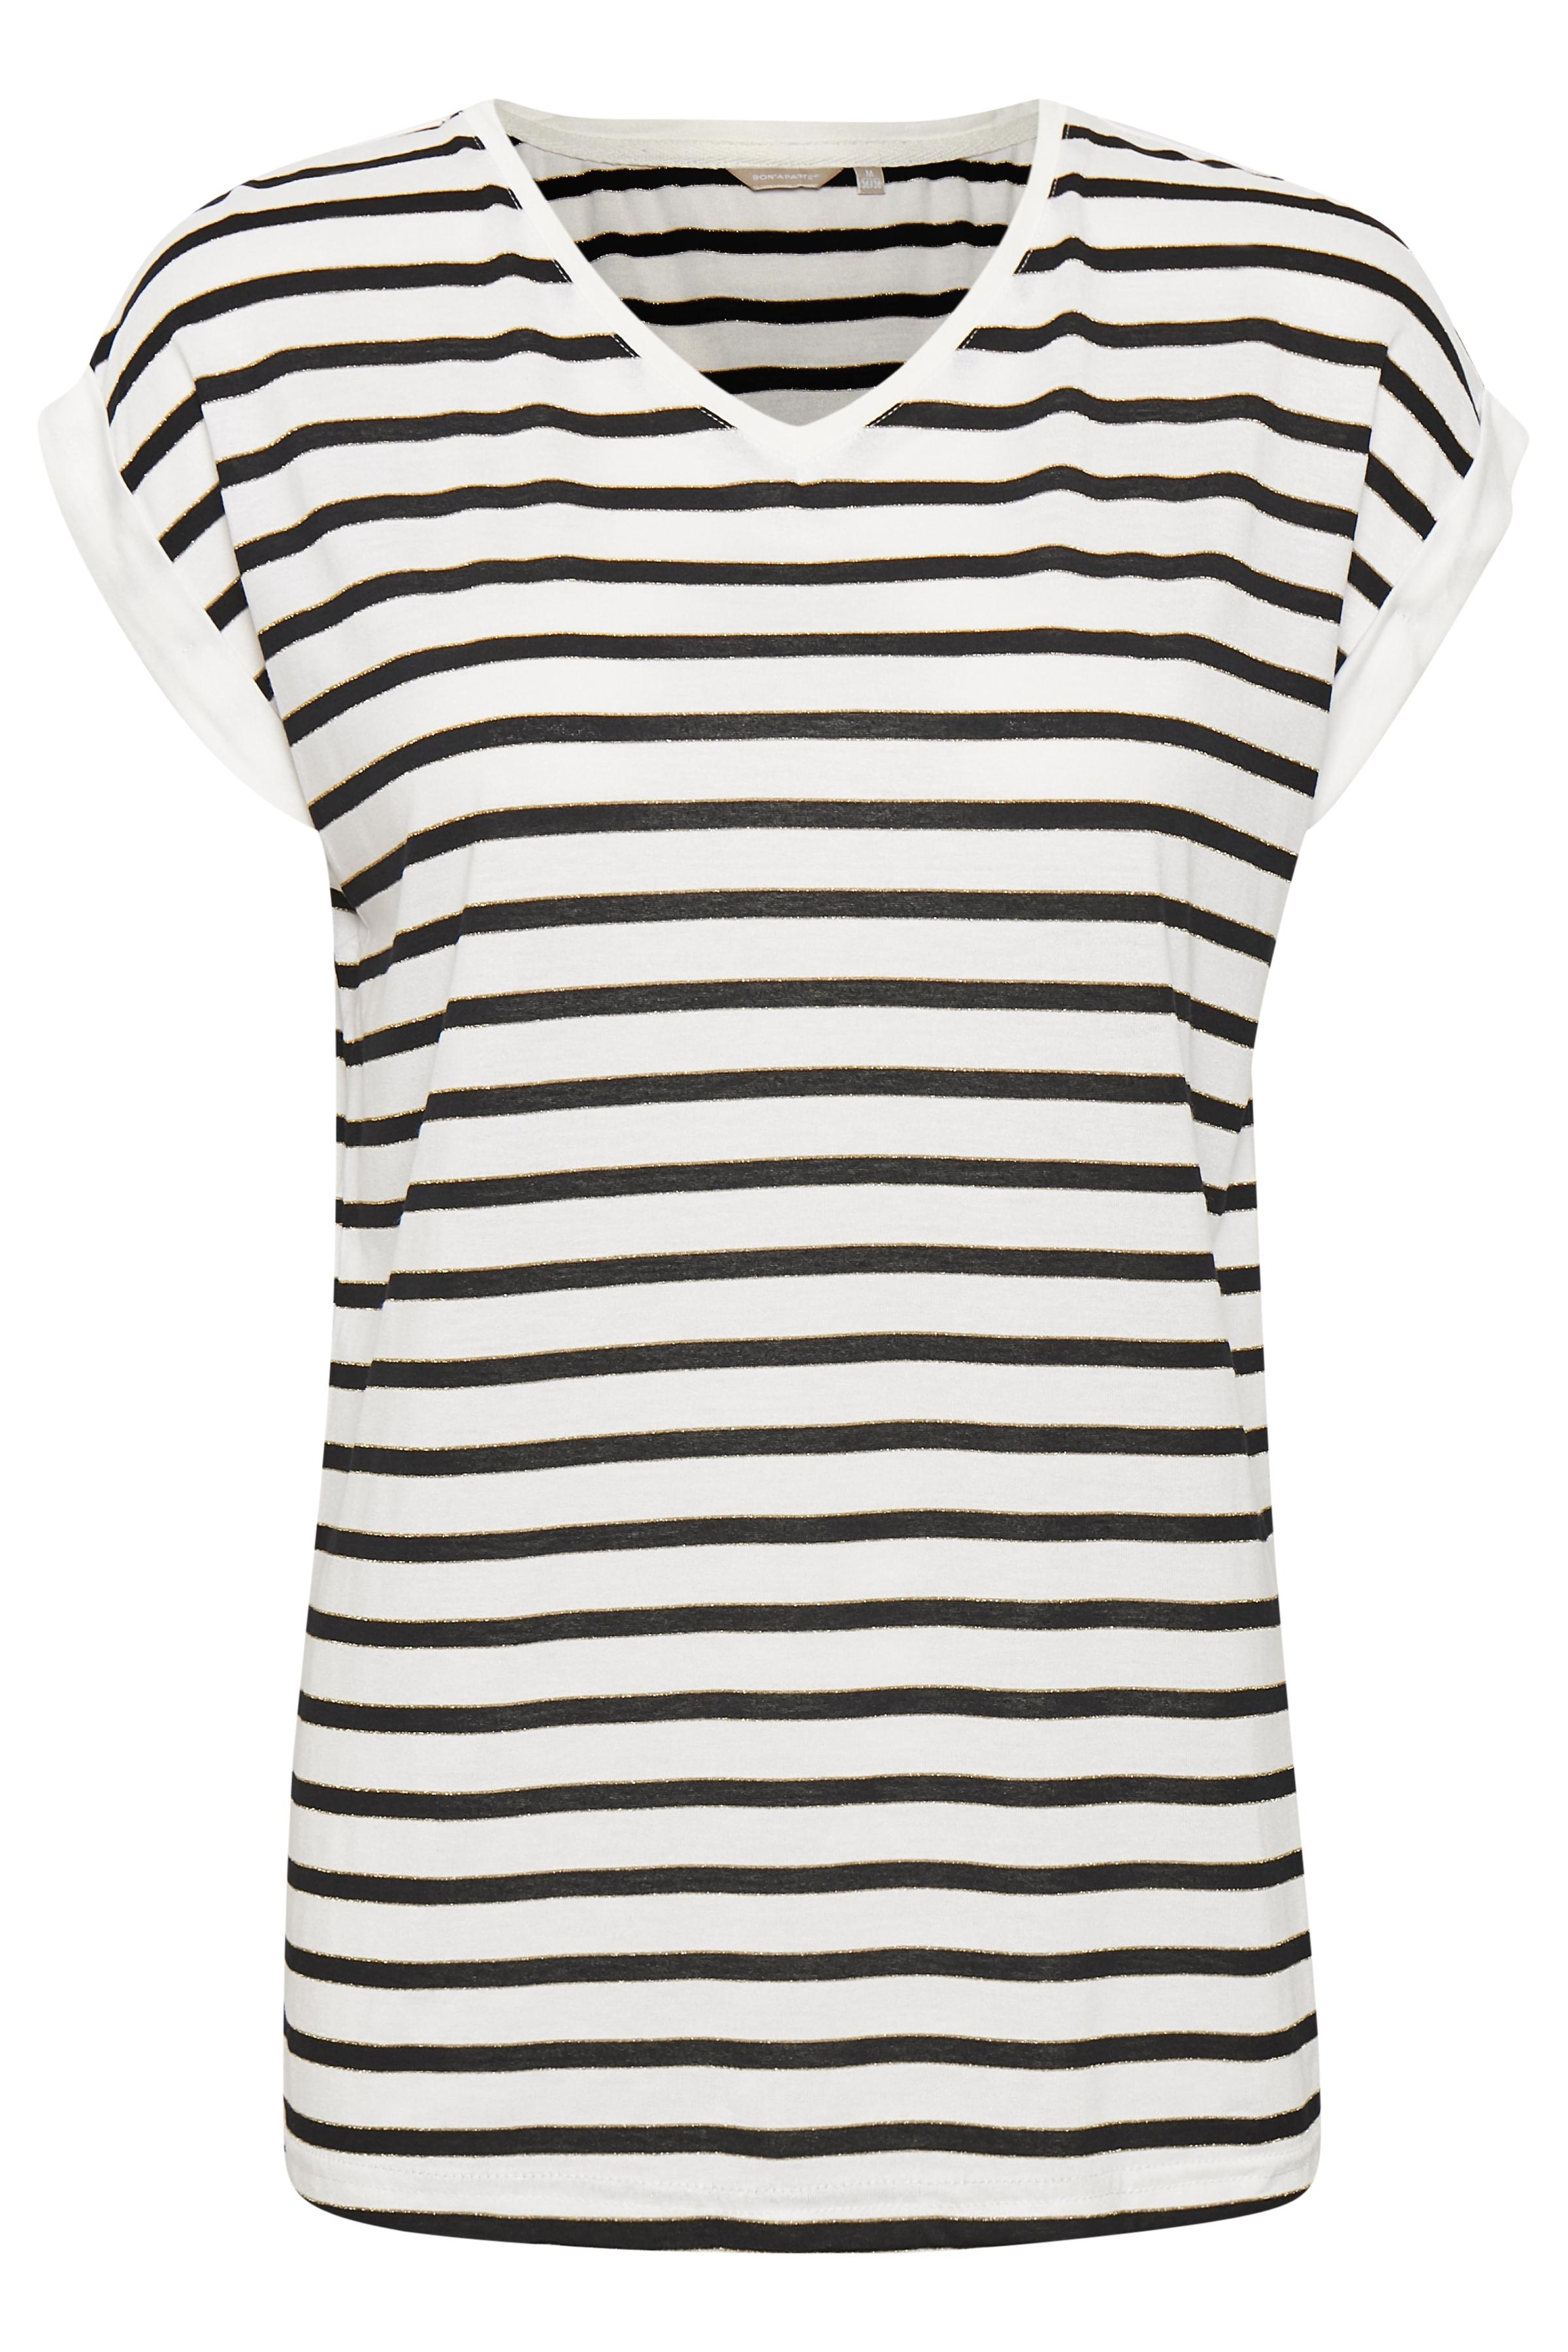 Image of BonA Parte Dame T-shirt - Off-white/marineblå